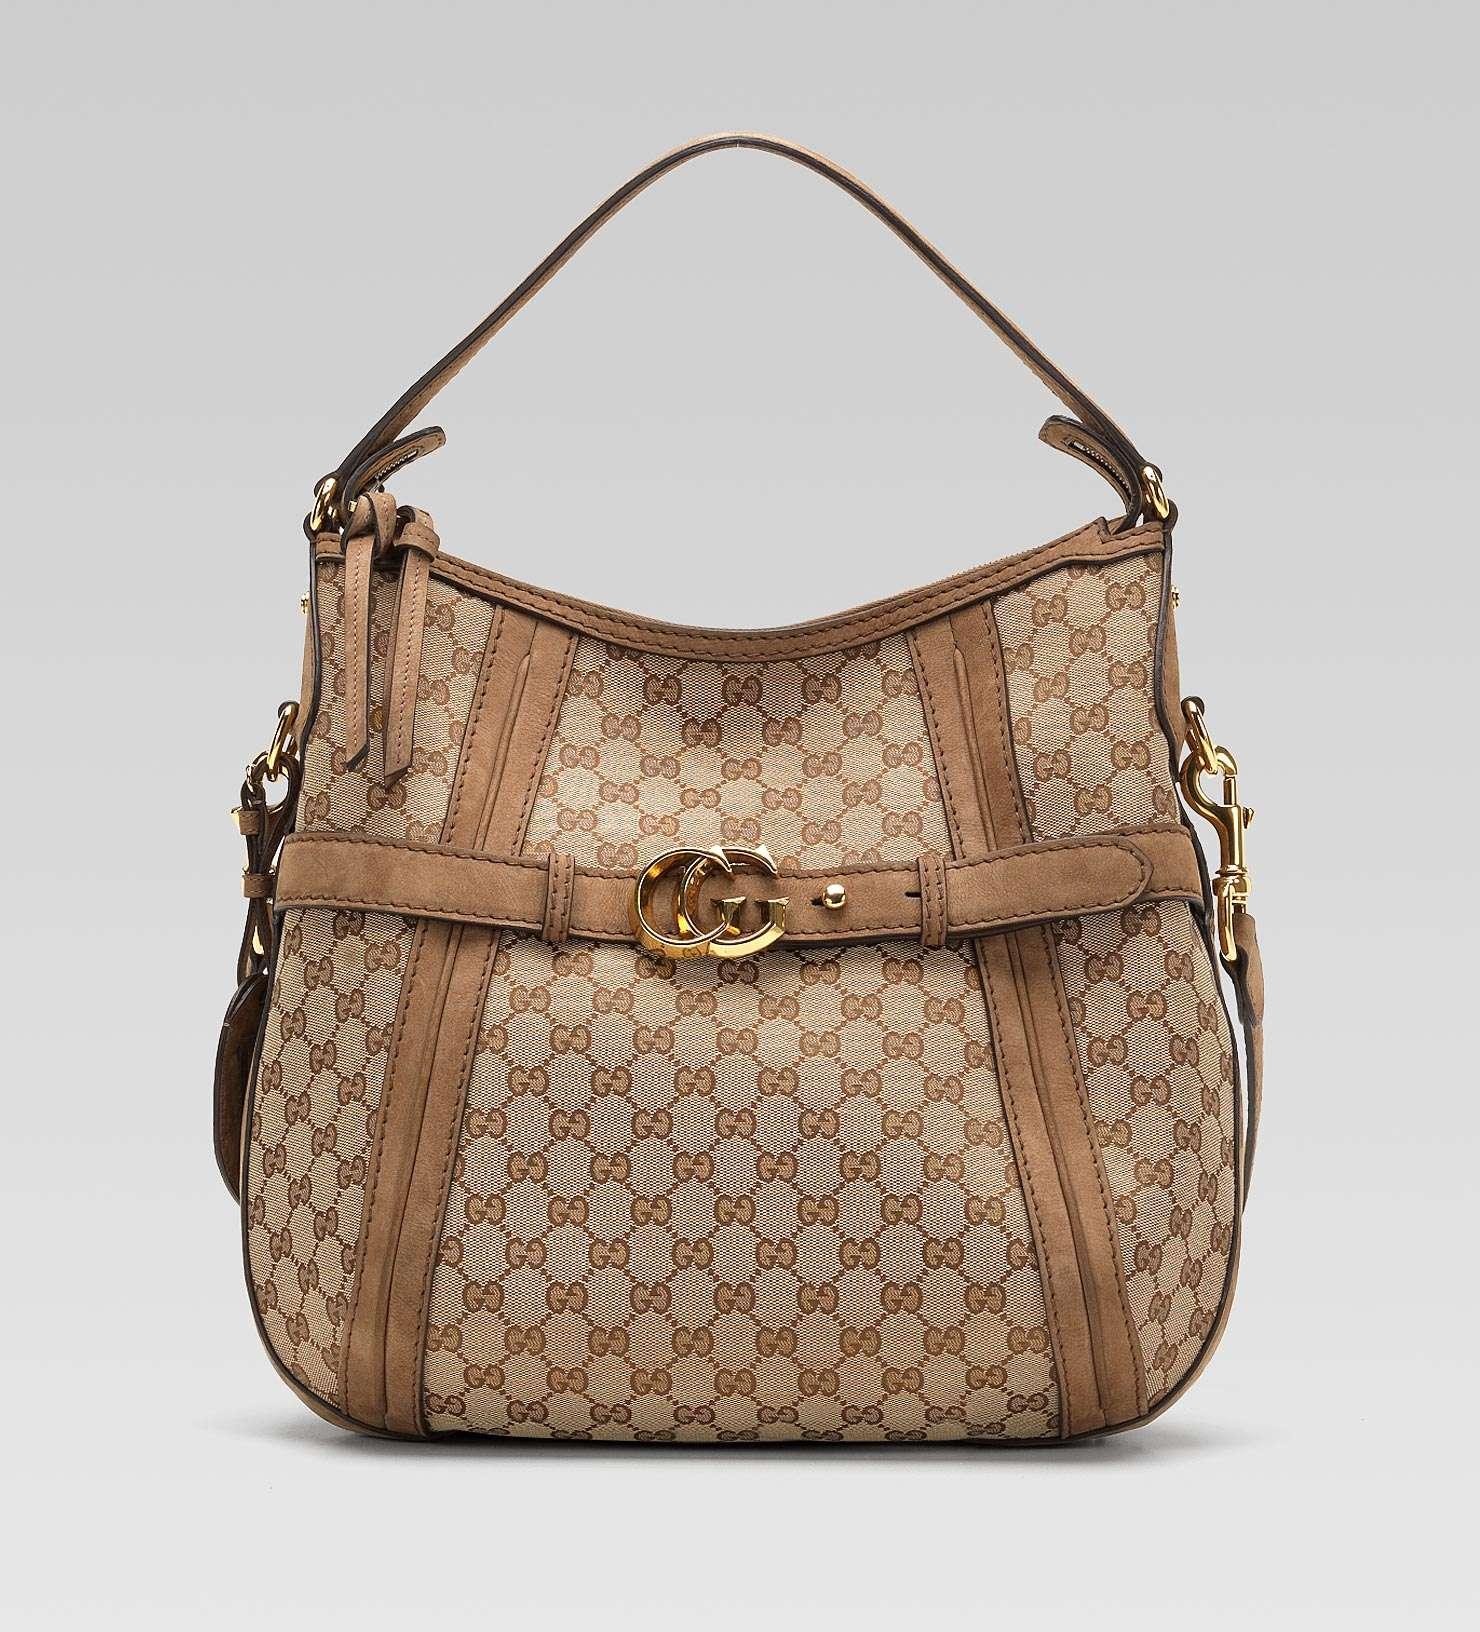 039acb2de72c84 gucci 2014 outlet for women cheap gucci handbags 2013 for cheap